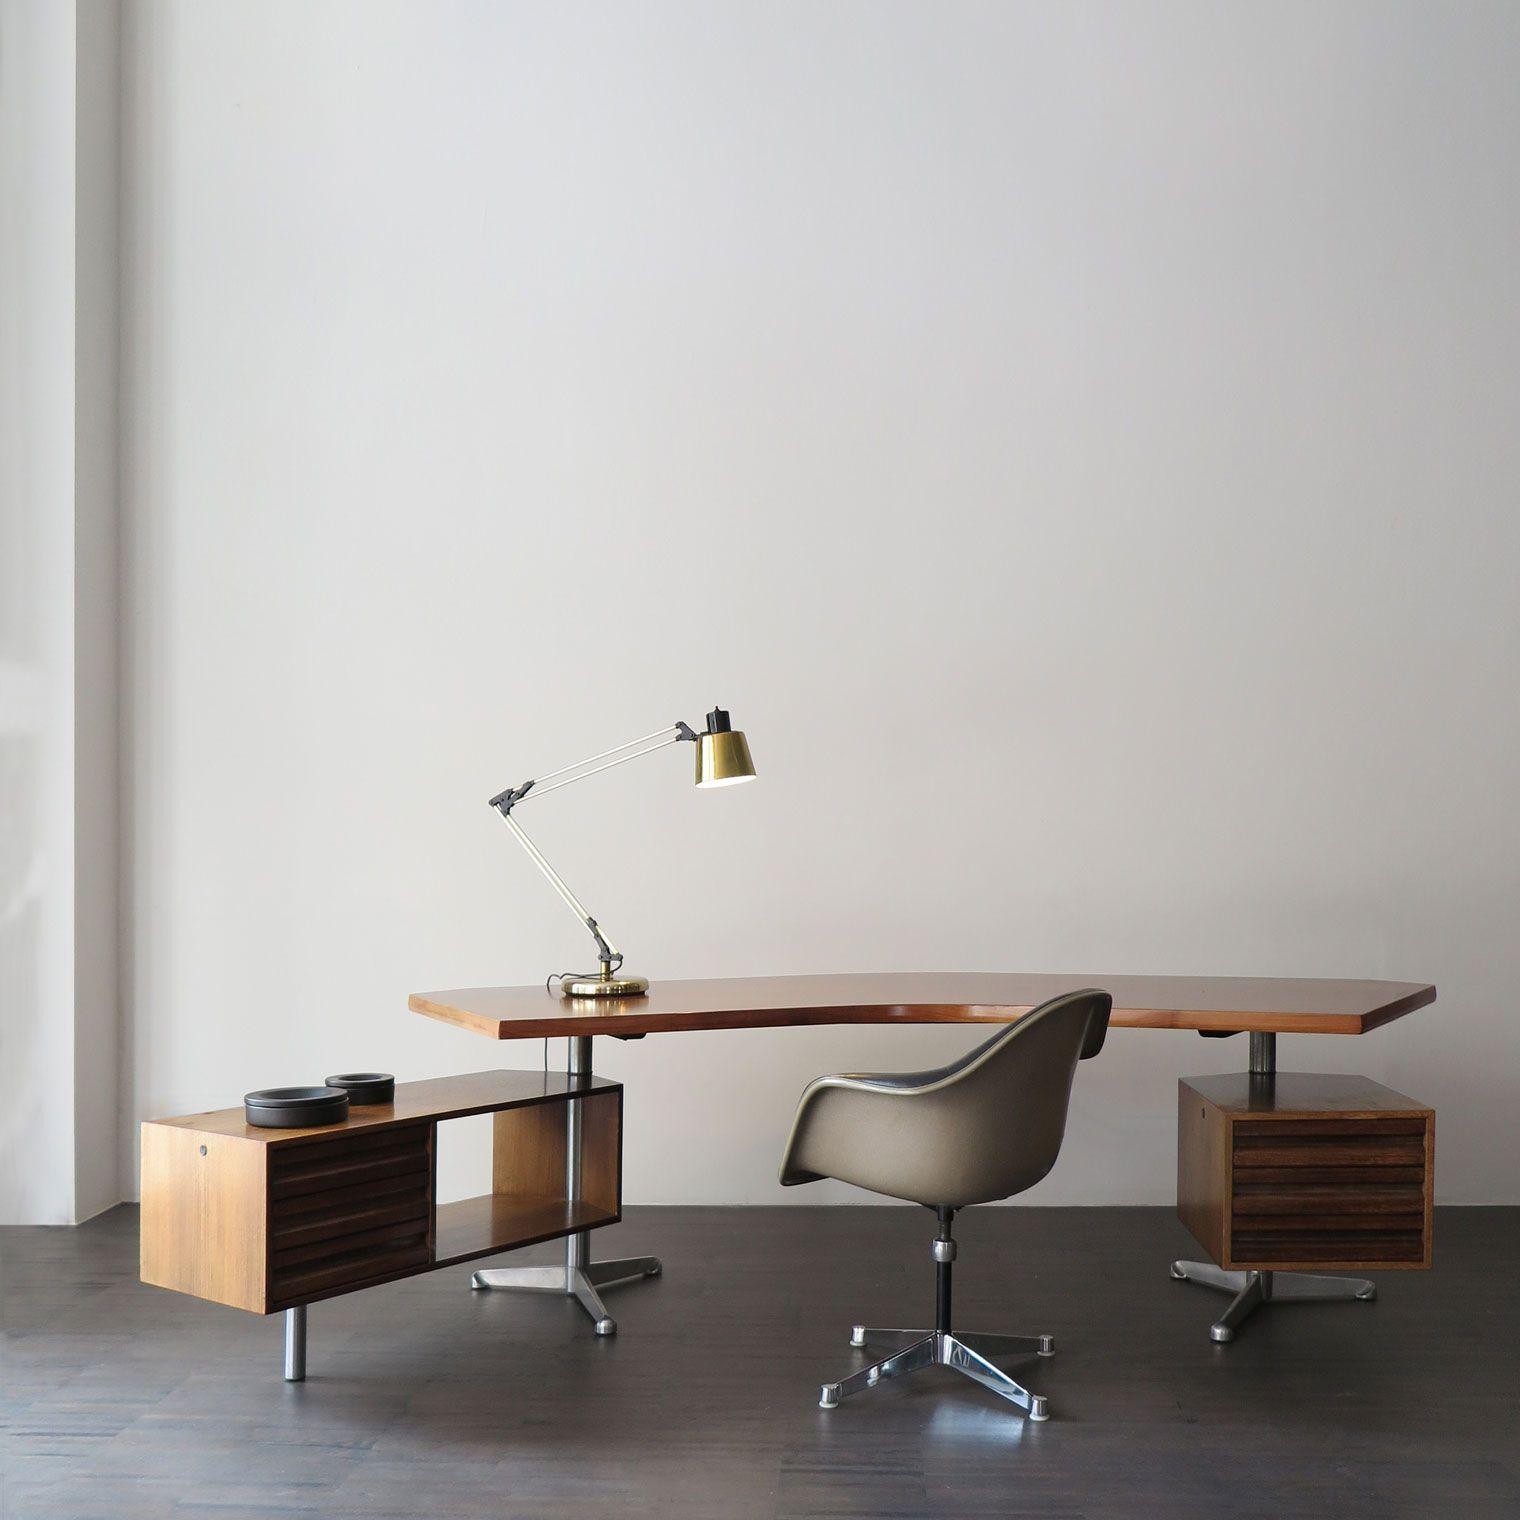 Design Scandinavo Anni 50 image by shakur deandre on herman miller in 2020 | home